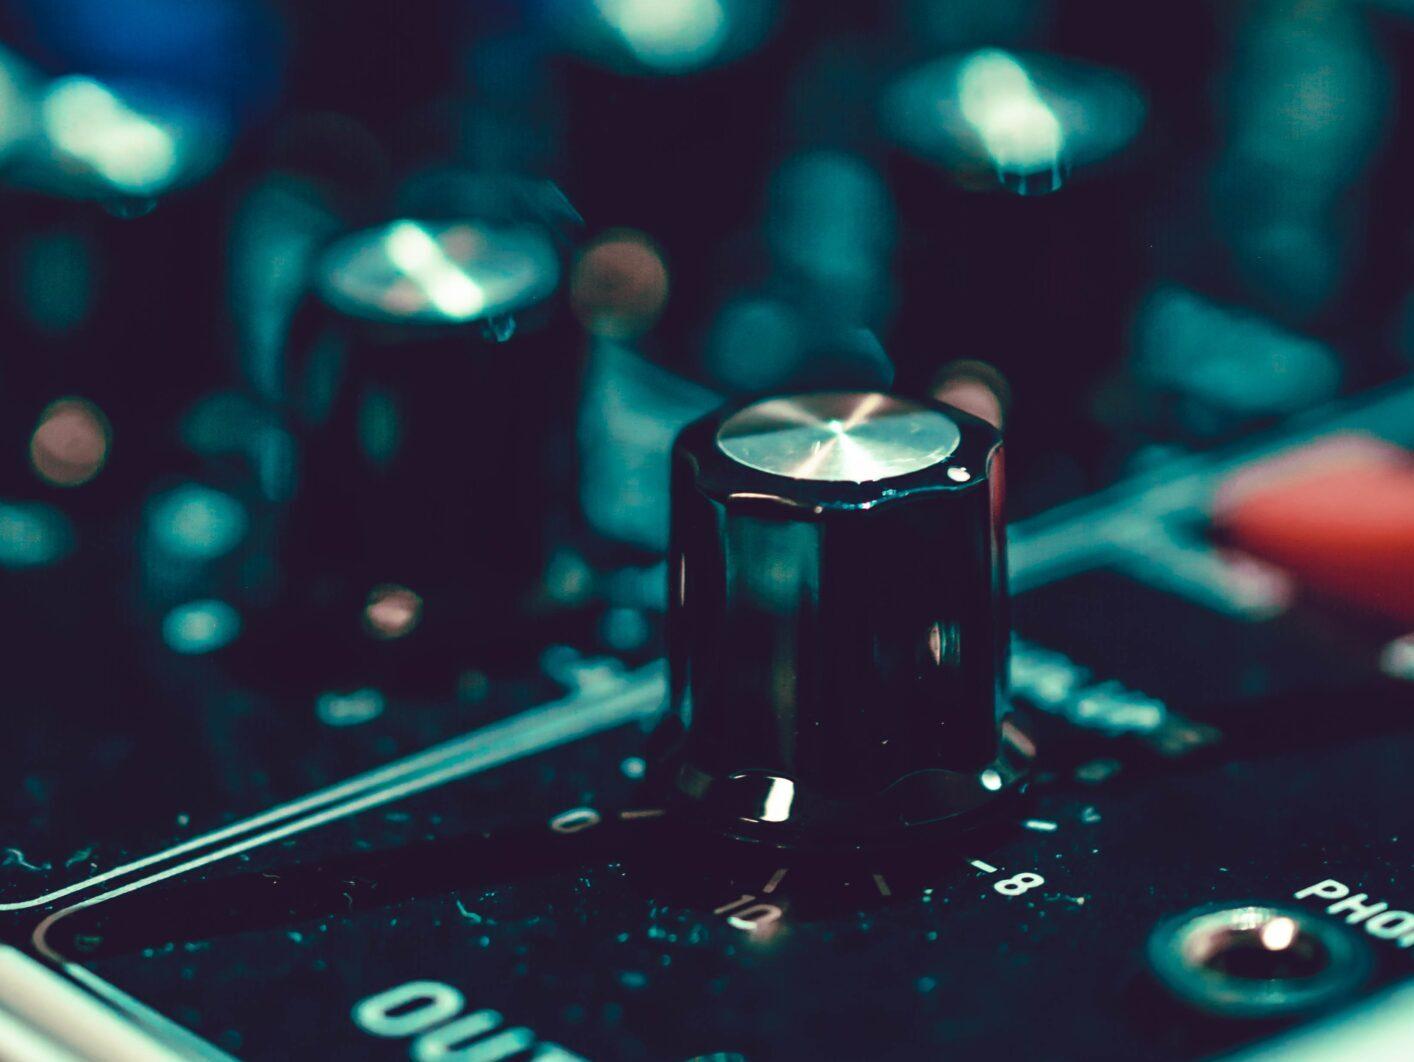 Close up shot of a mixing board